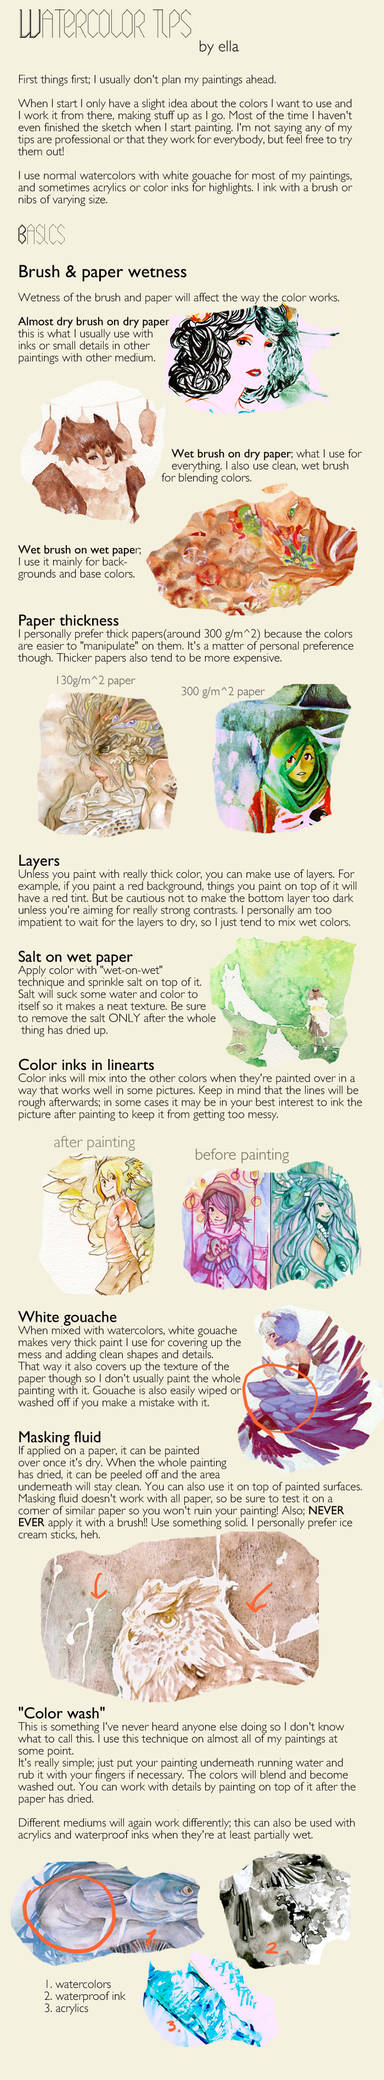 Watercoloring tips